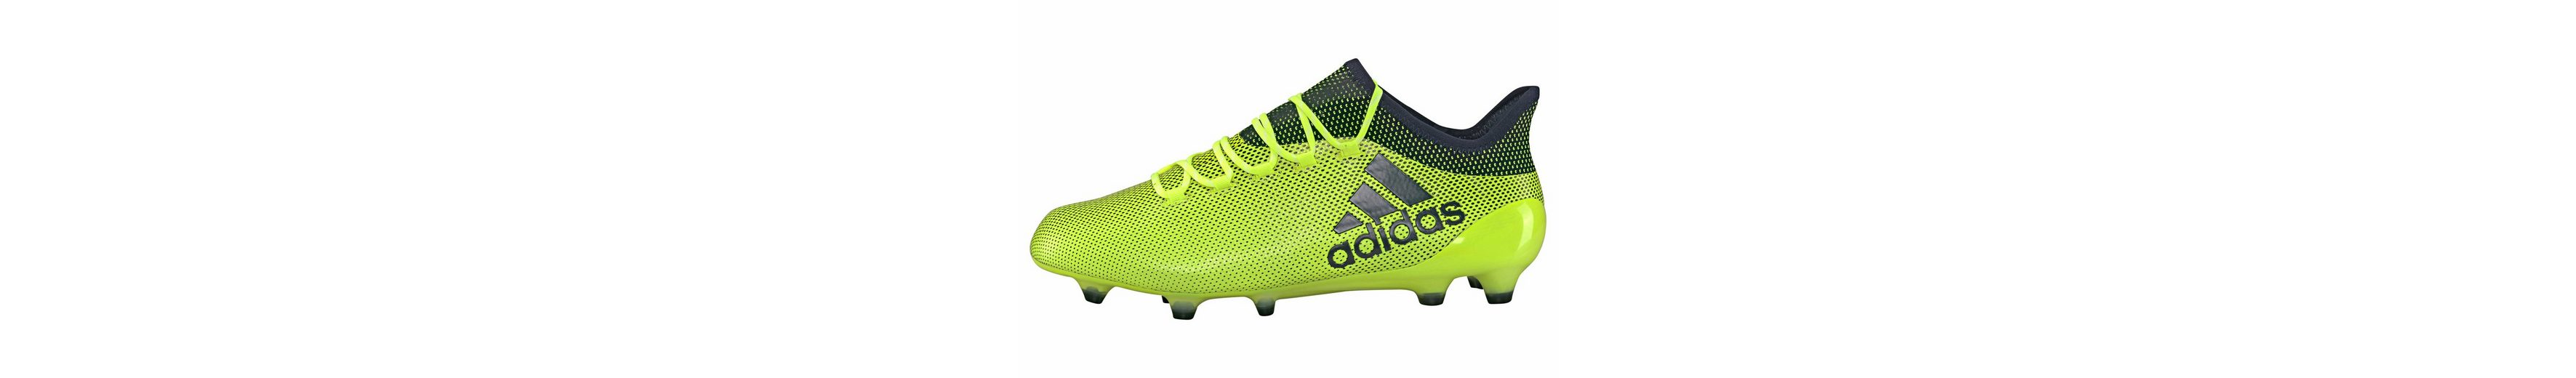 adidas adidas y FG Fu脽ballschuh X 1 Performance 17 Performance aqfZw5